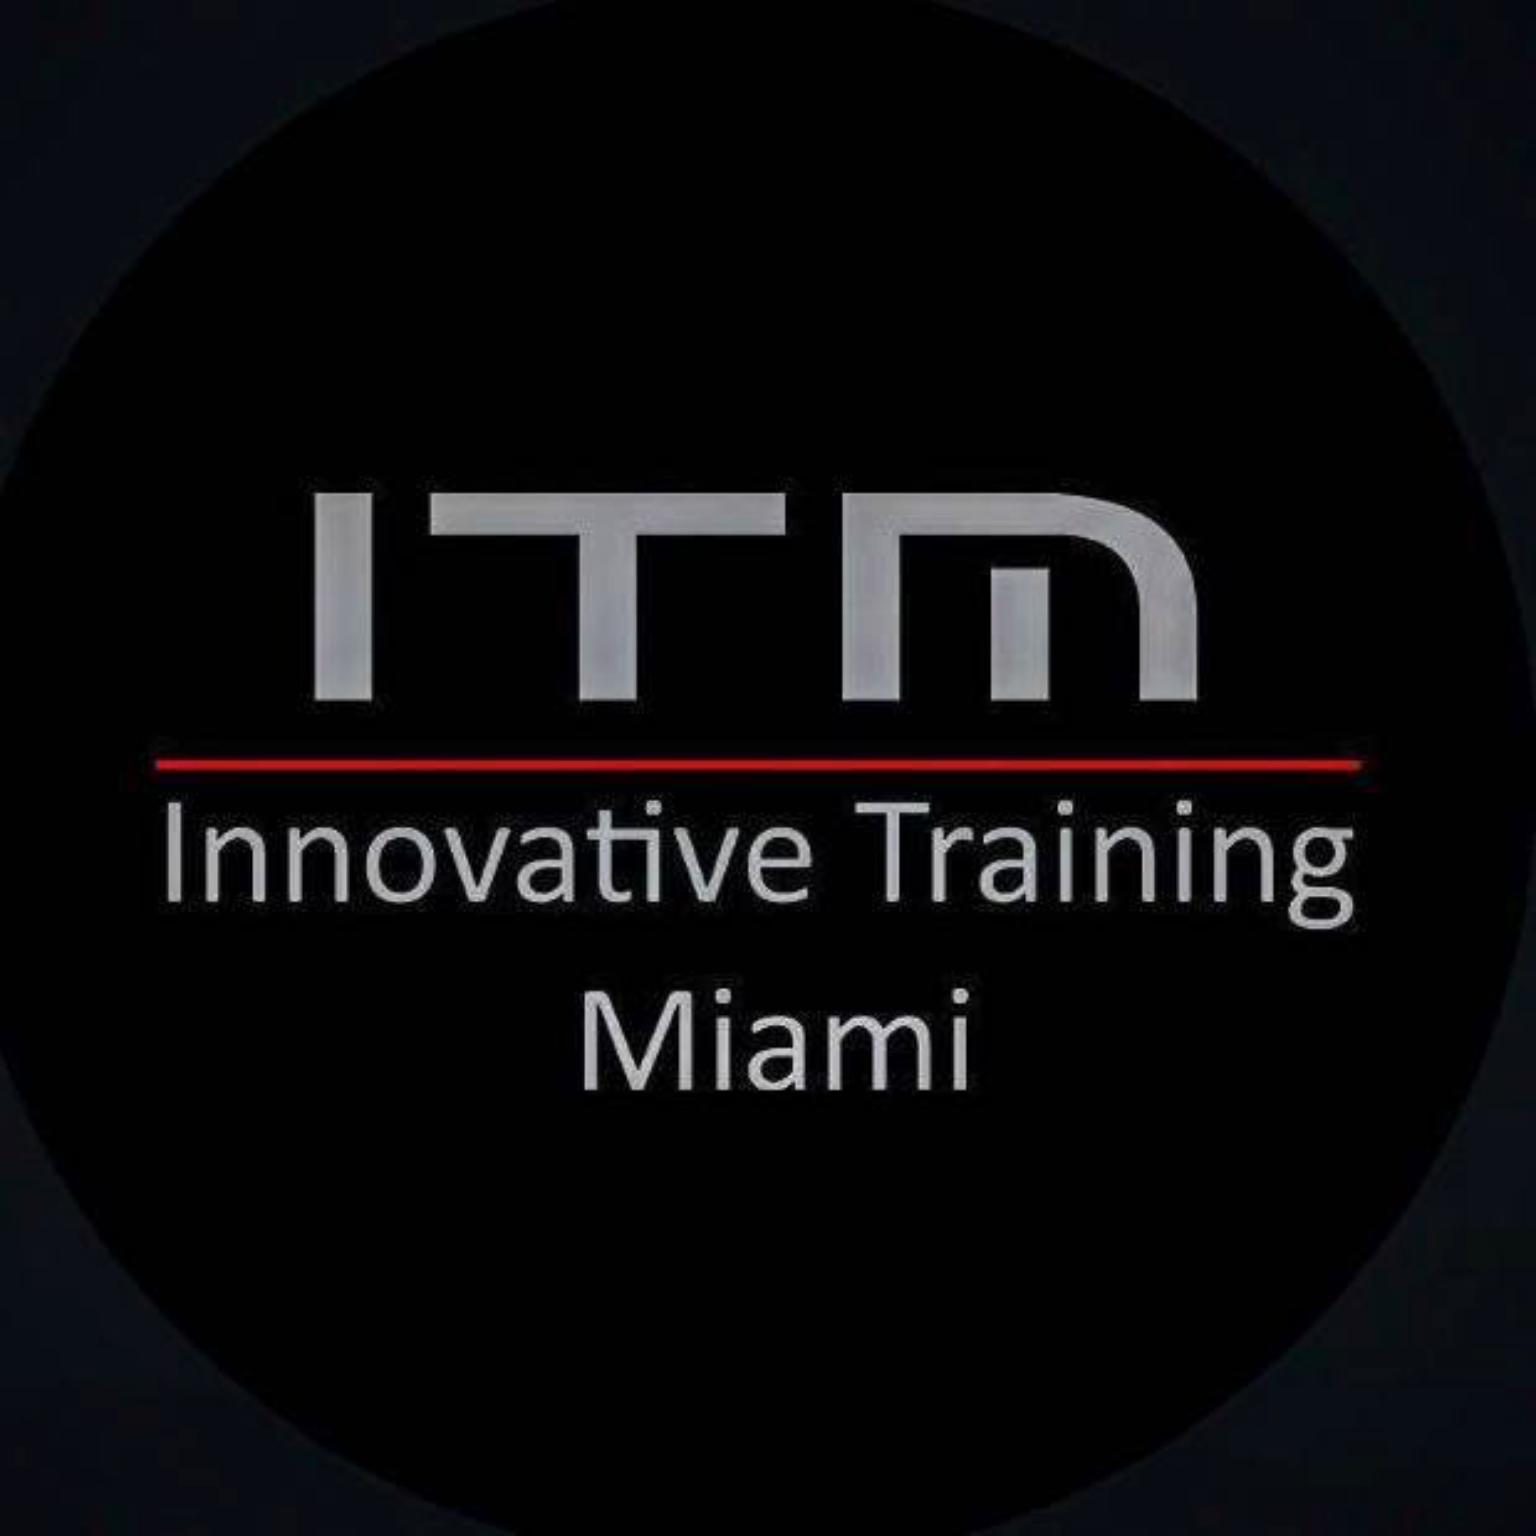 Innovative Training Miami